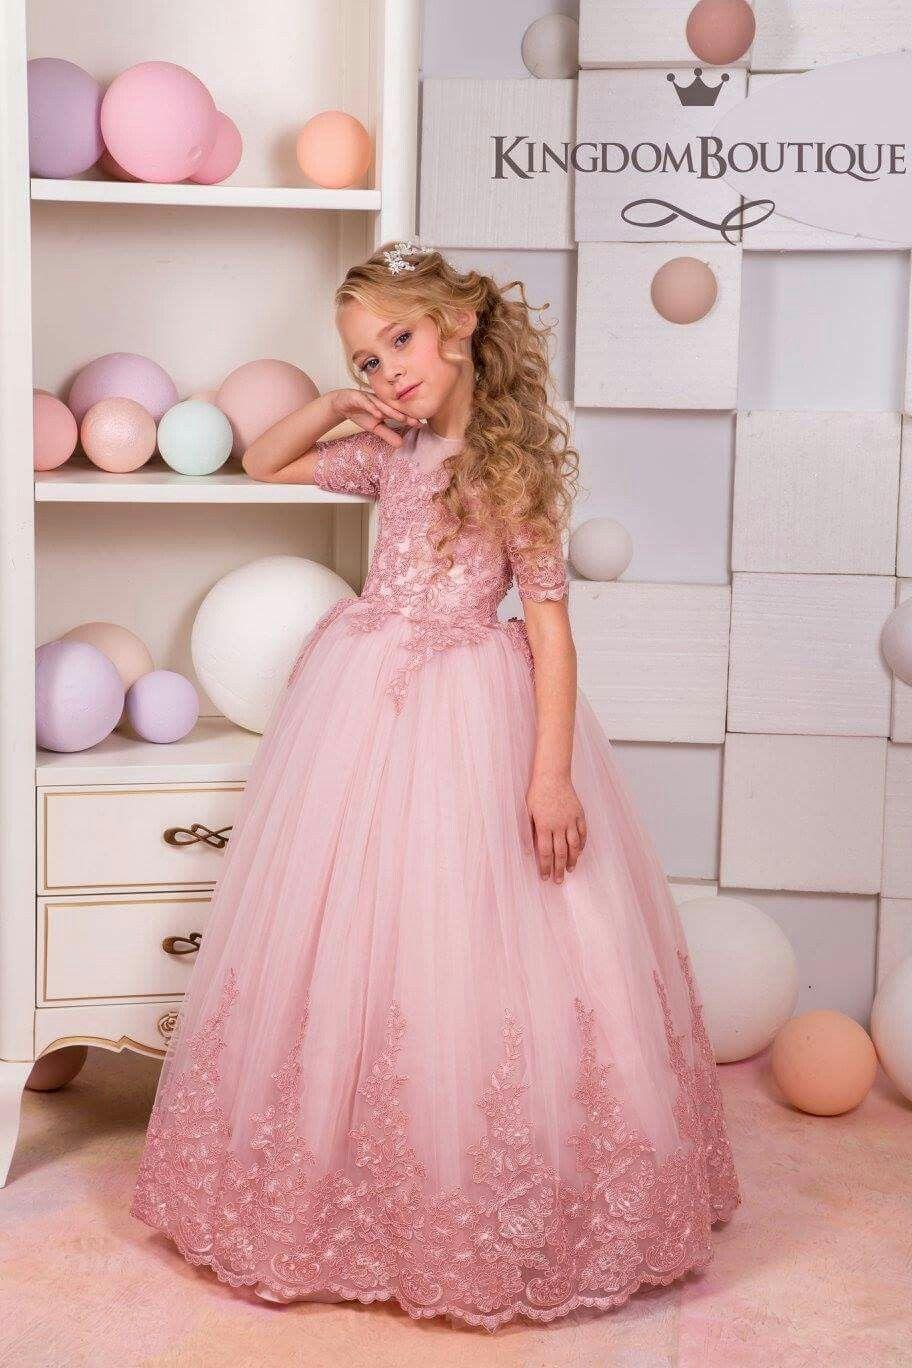 Pin de Mayeli Estrada Velazquez en Girls Dresses | Pinterest ...